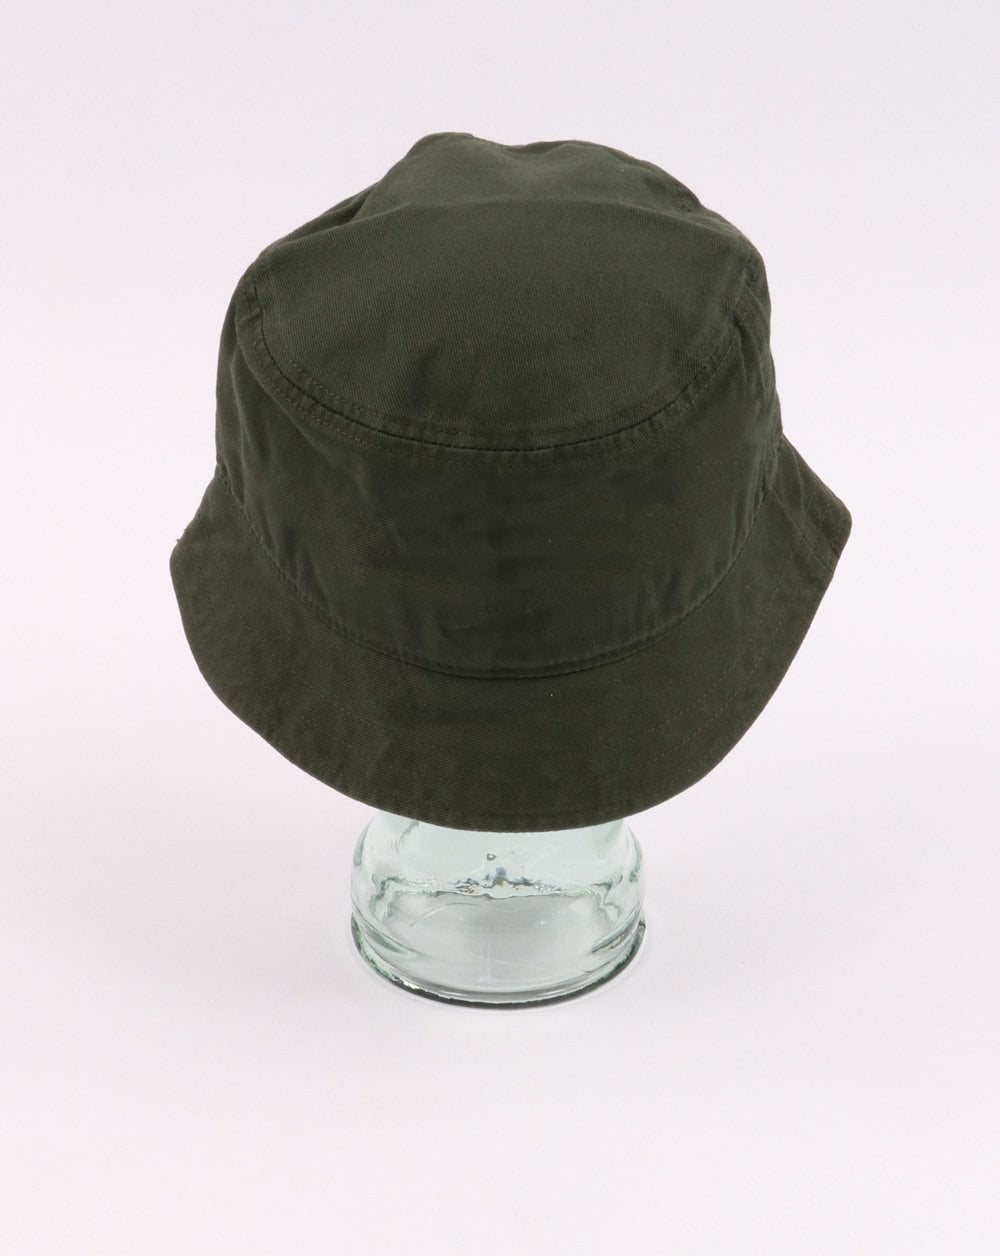 3dab81b0 Lyle And Scott Cotton Twill Bucket Hat Leaf Green